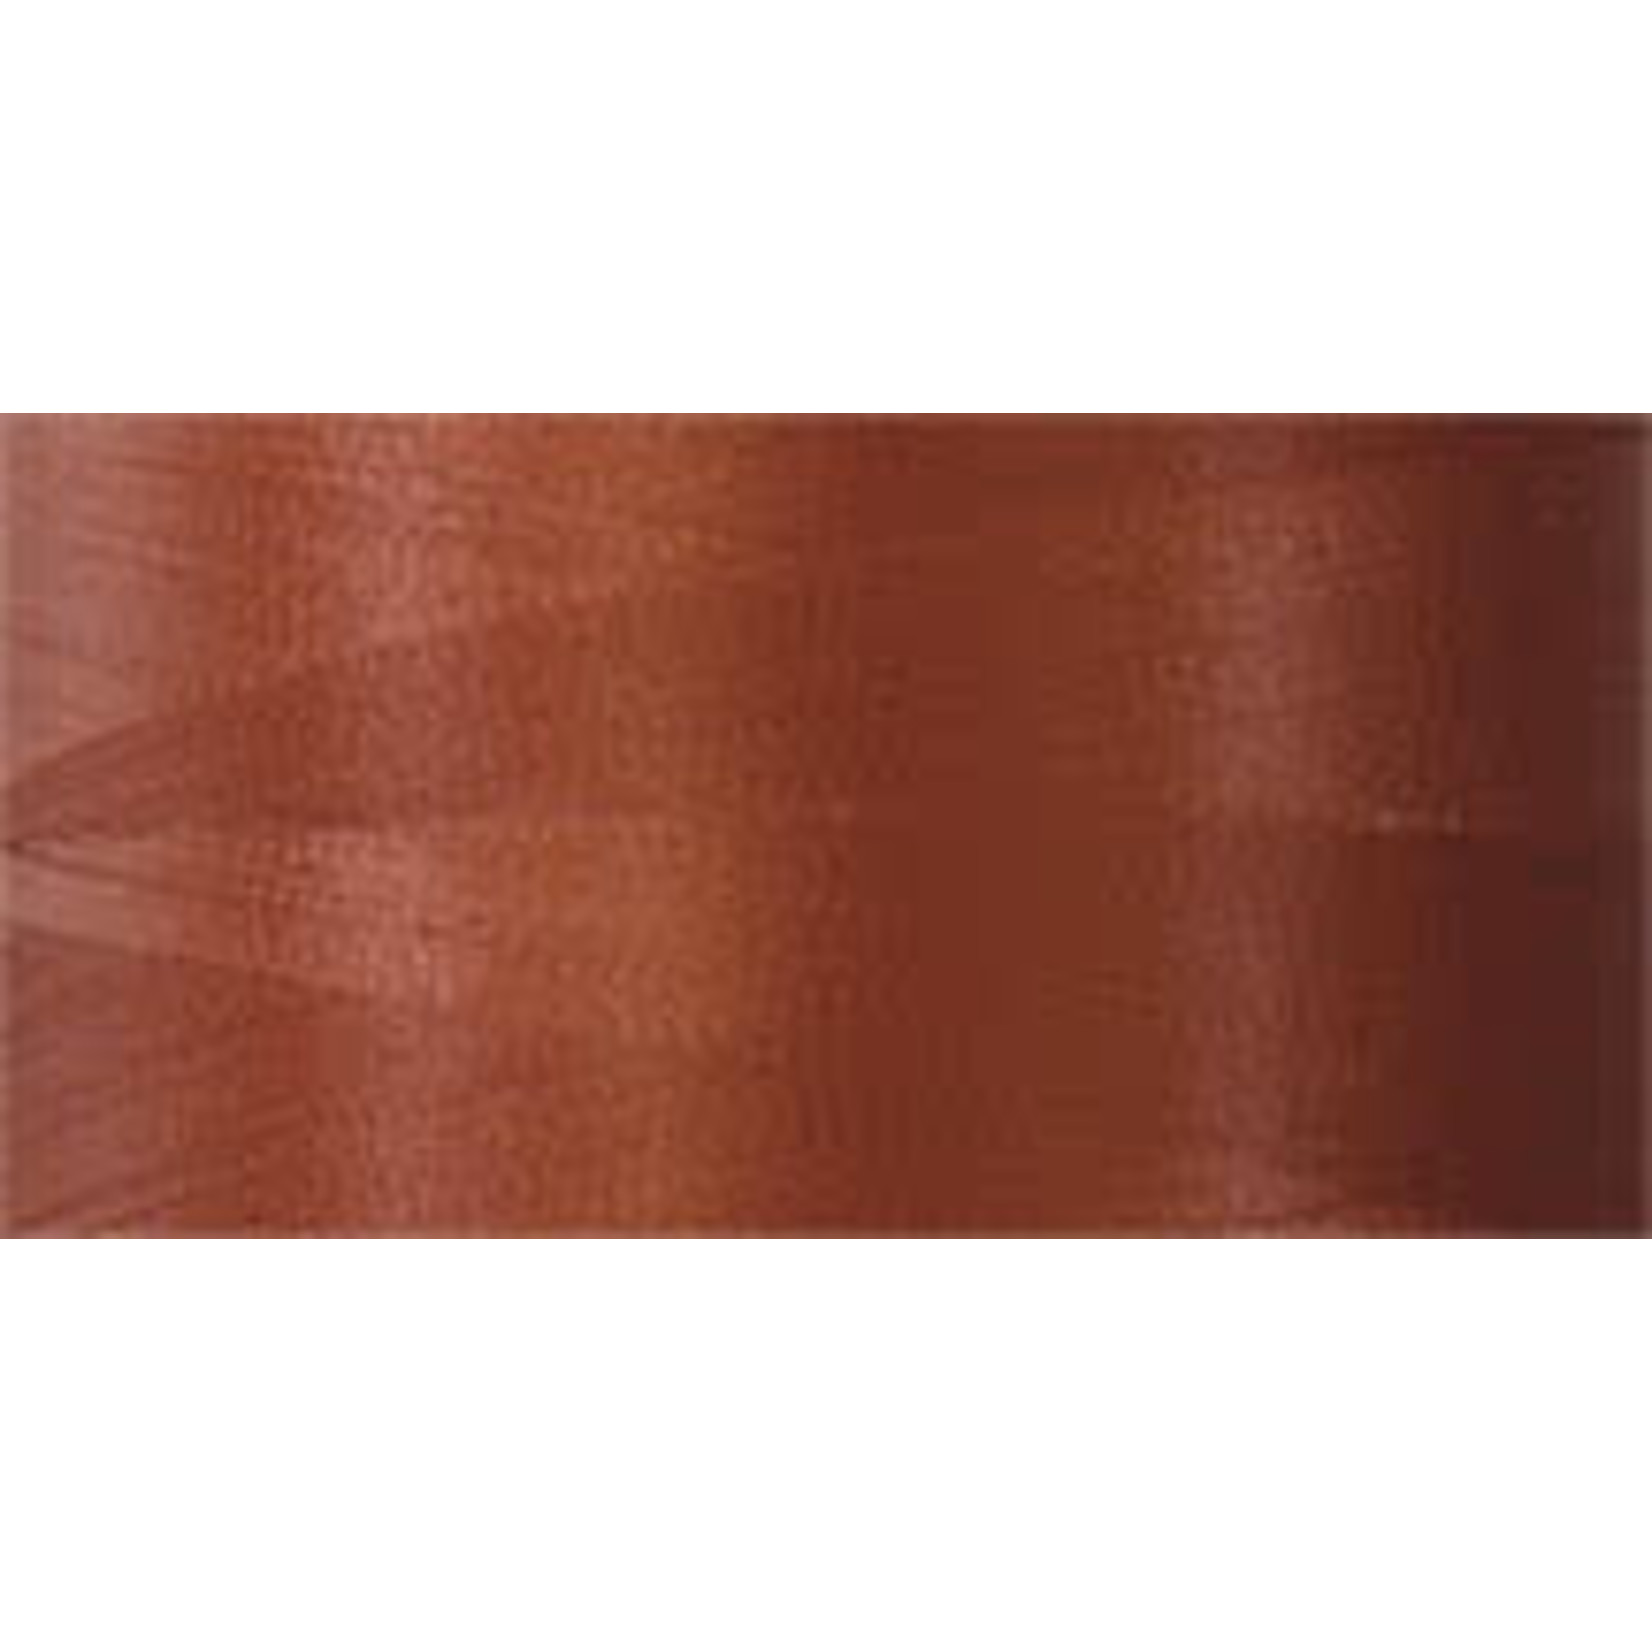 Superior Threads Bottom Line - #60 - 1300 m - 616 Copper